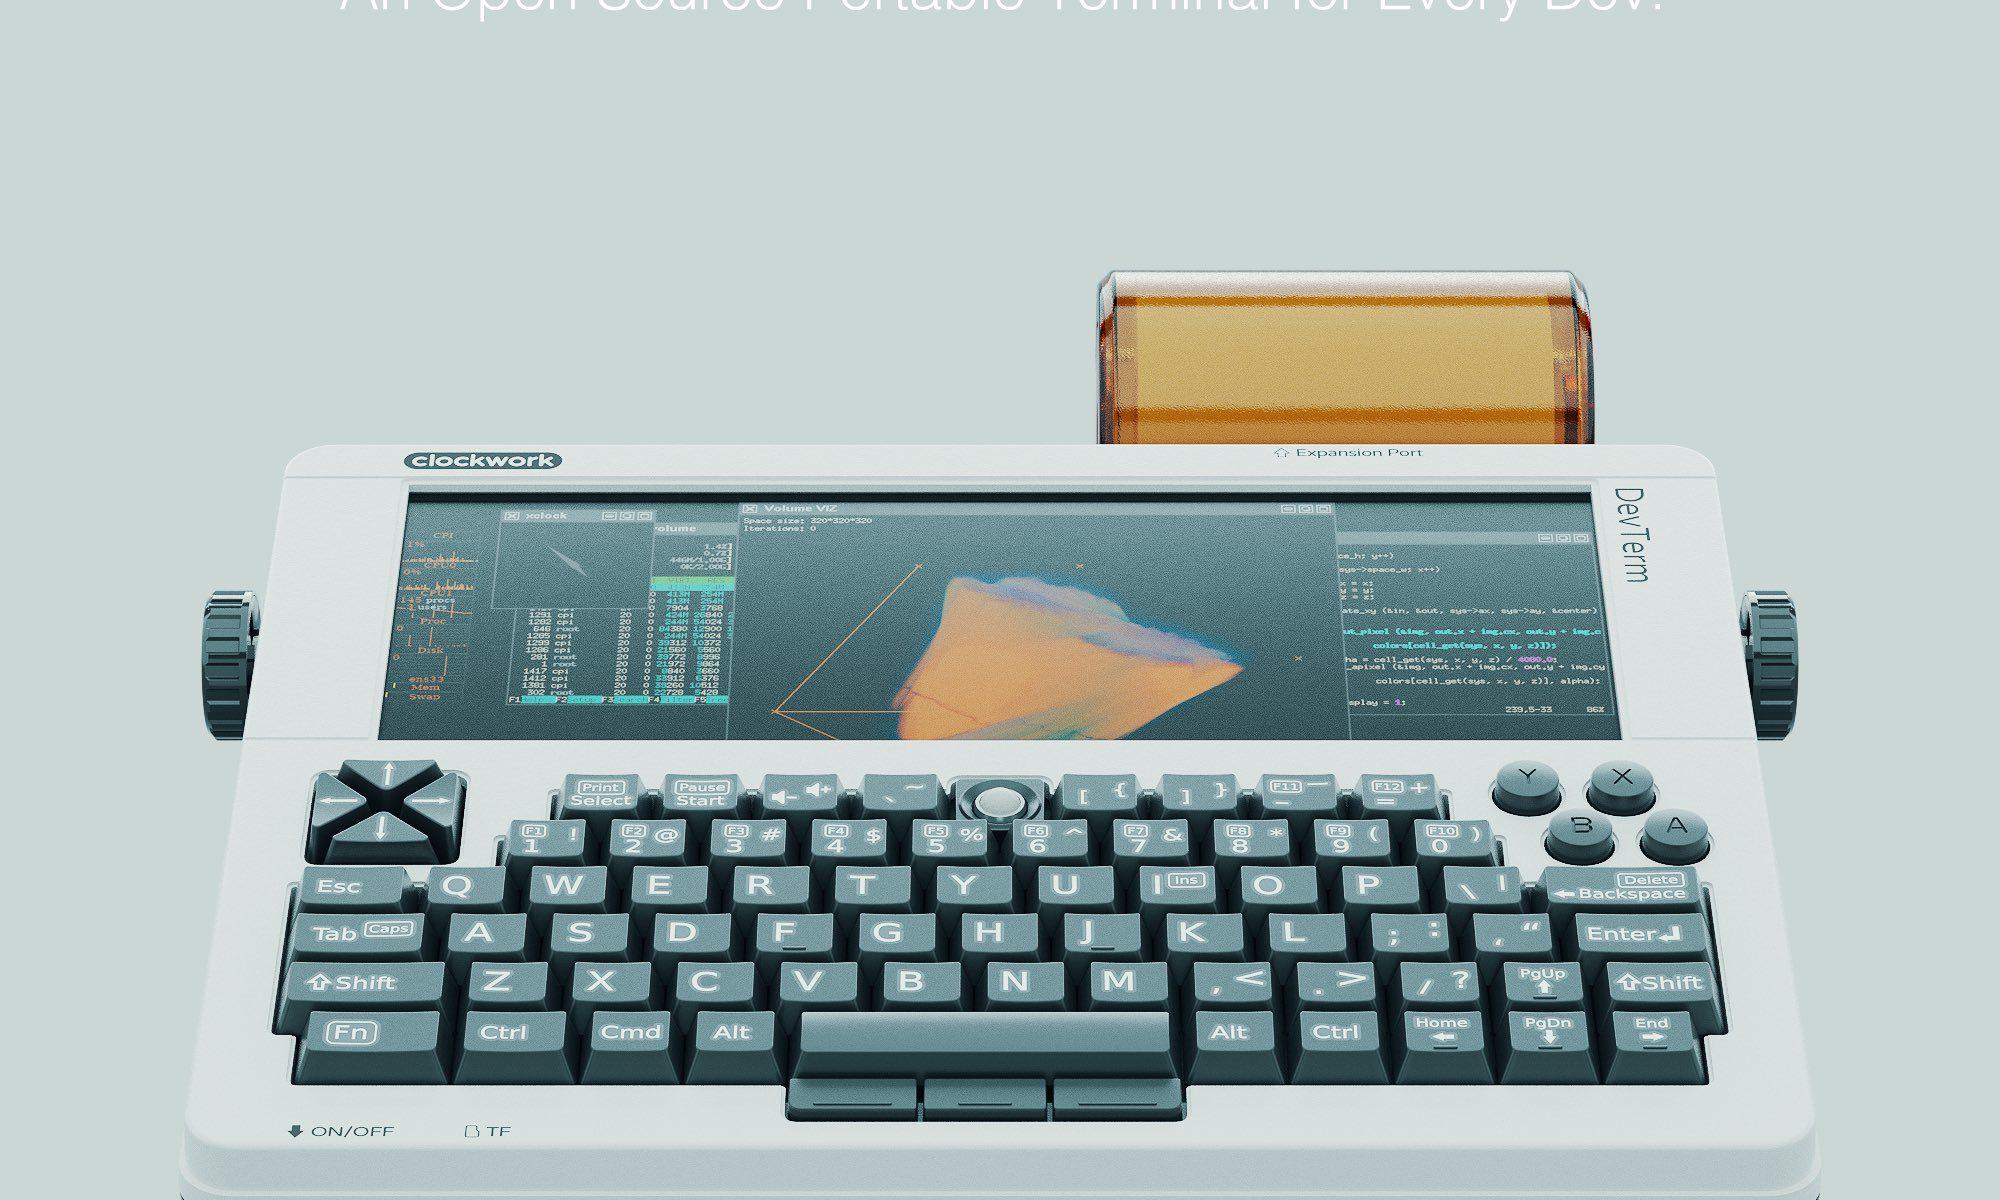 DevTerm Portable Computer